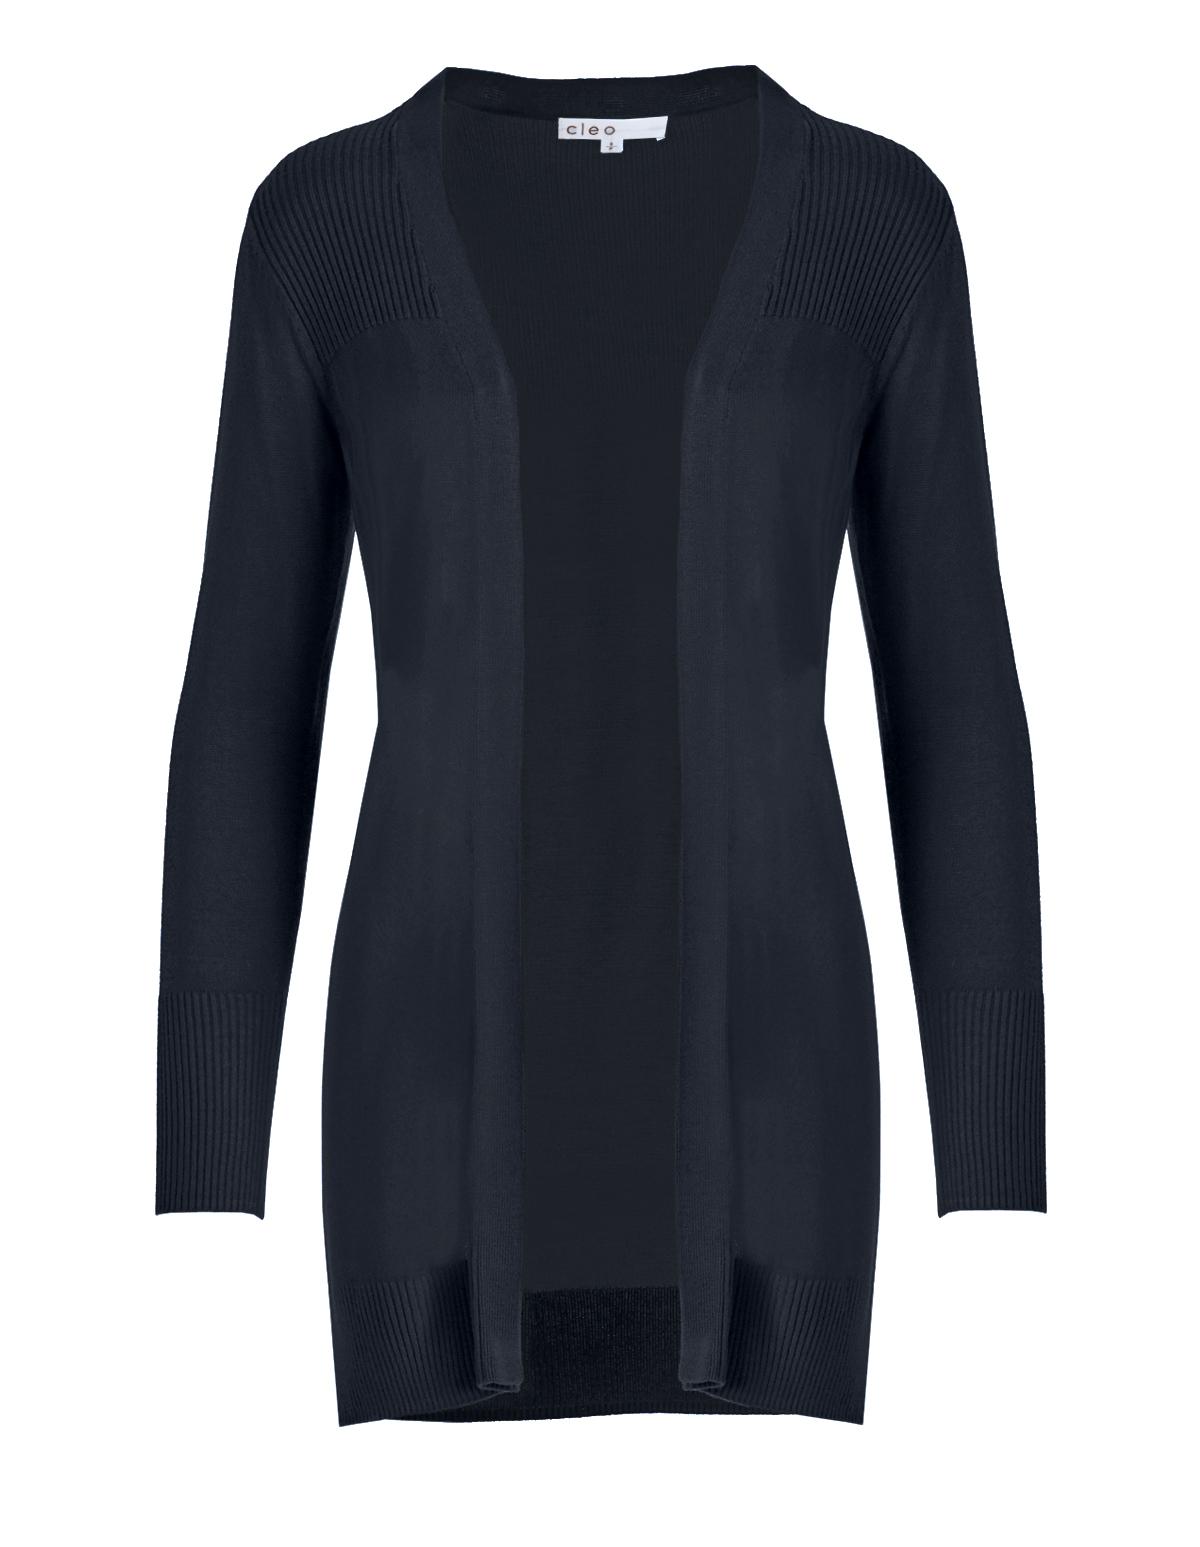 Navy Lightweight Cardigan Sweater | Cleo